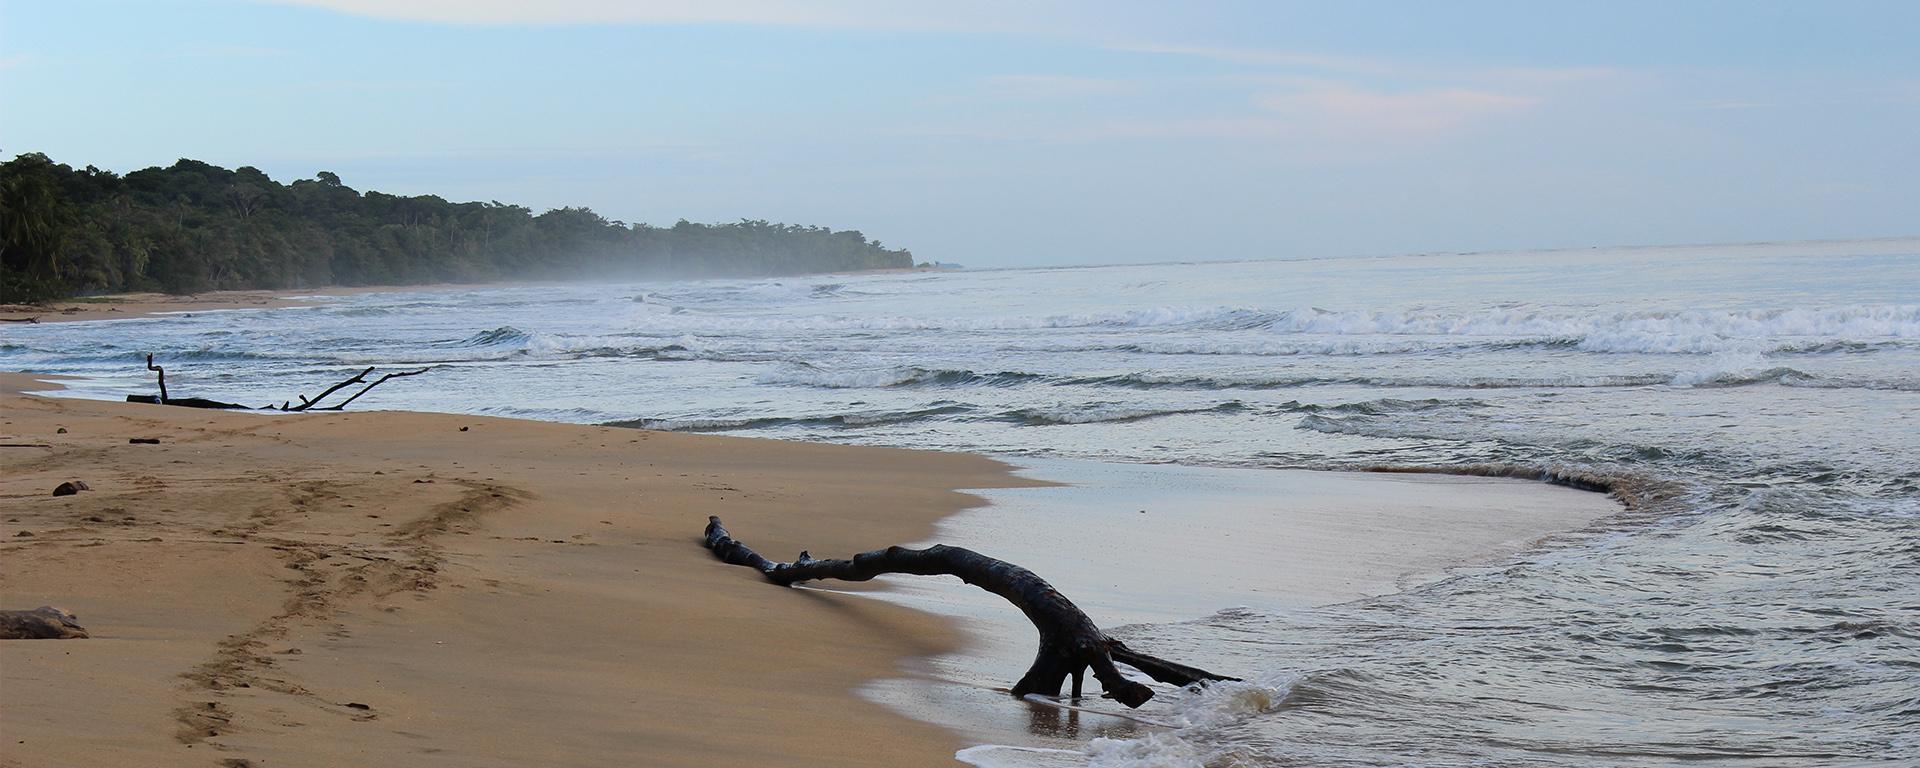 Pura Vida Costa Rica – Träume werden wahr…